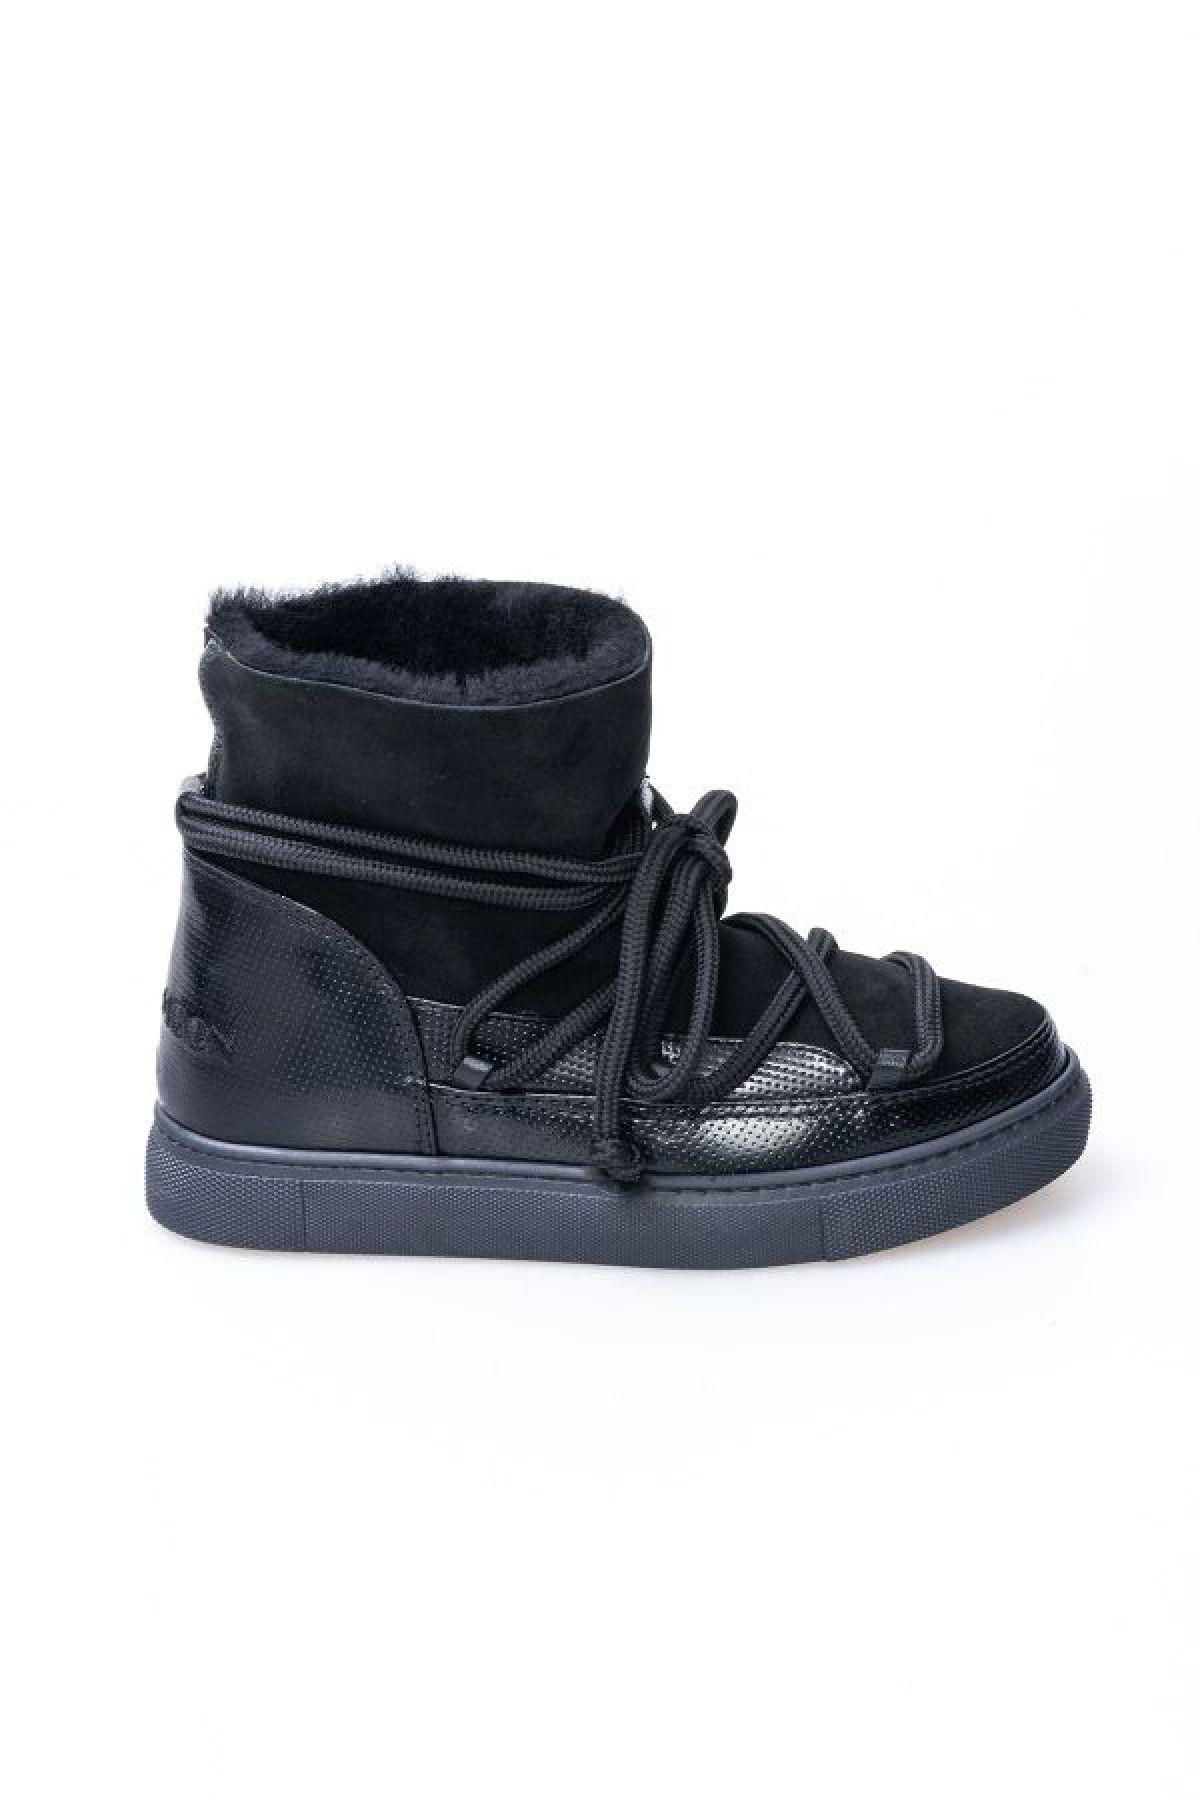 Cool Moon Genuine Patent Leather & Sheepskin Women's Lace-up Sneaker 355129 Black